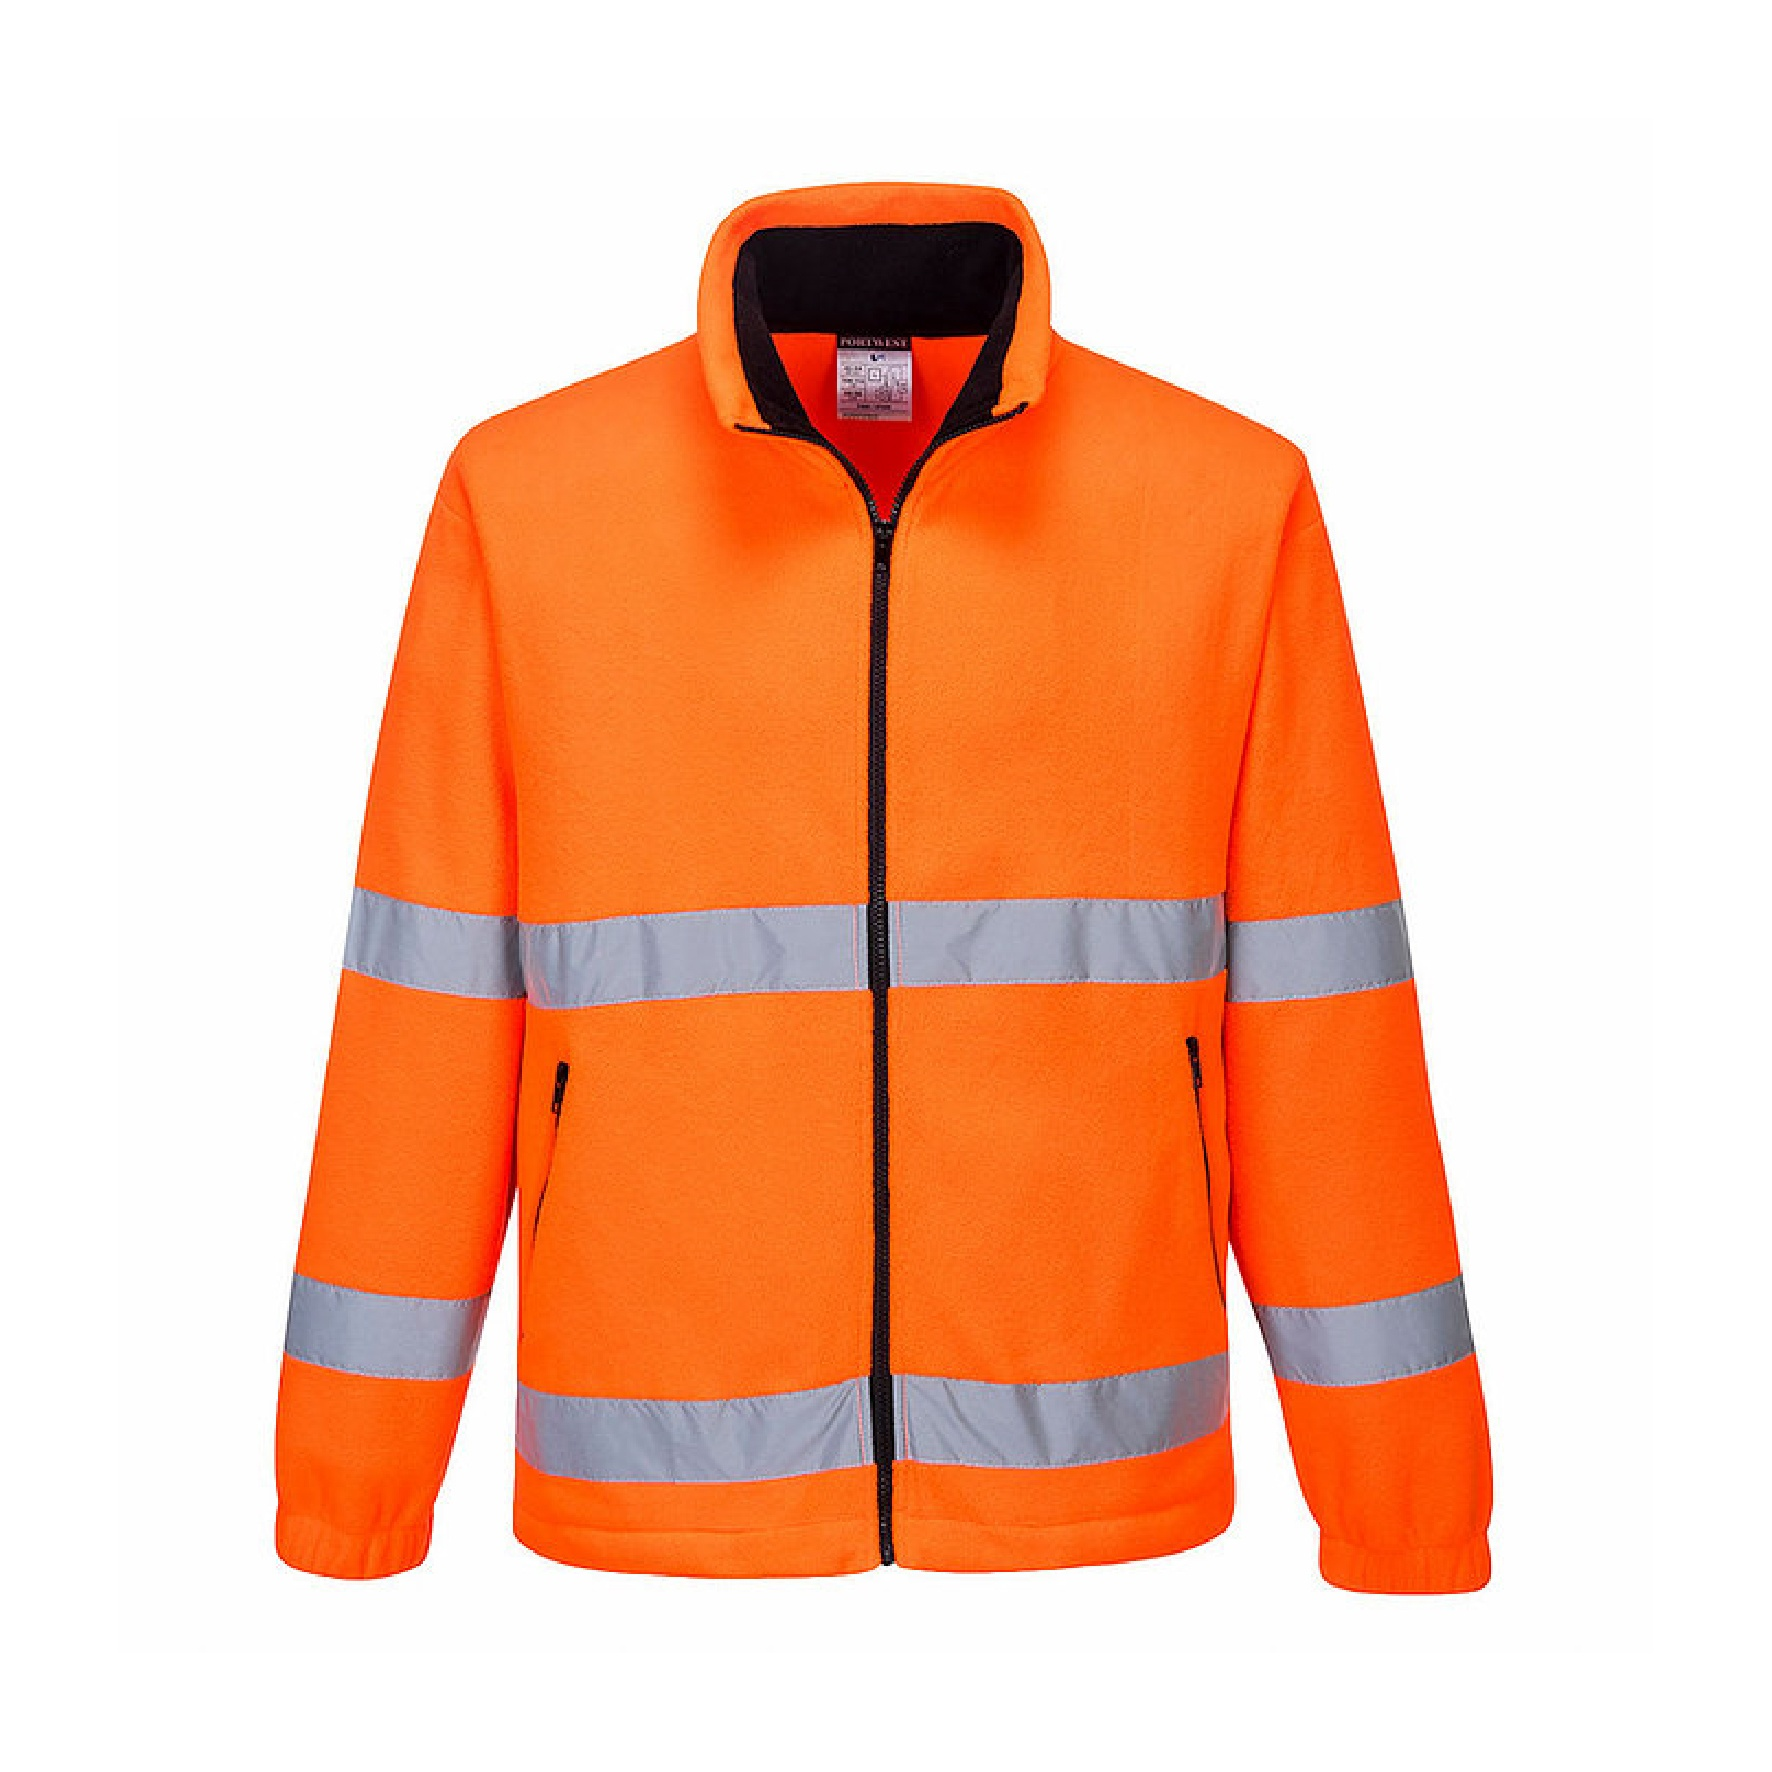 Redrok Workwear Centre Plymouth Hi-Vis Essential Fleece - Orange